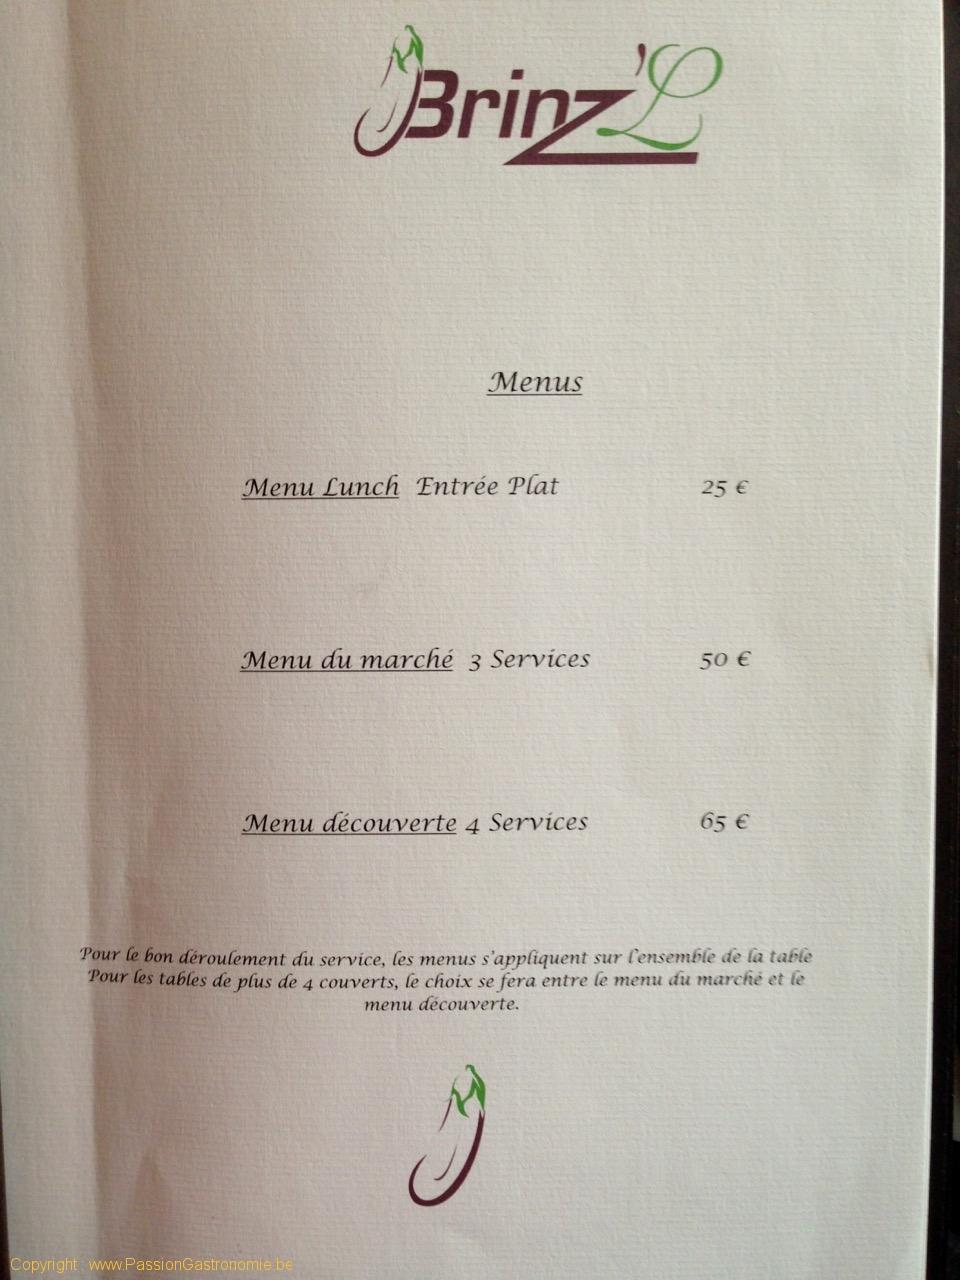 Brinzl, restaurant à Uccle - Menus